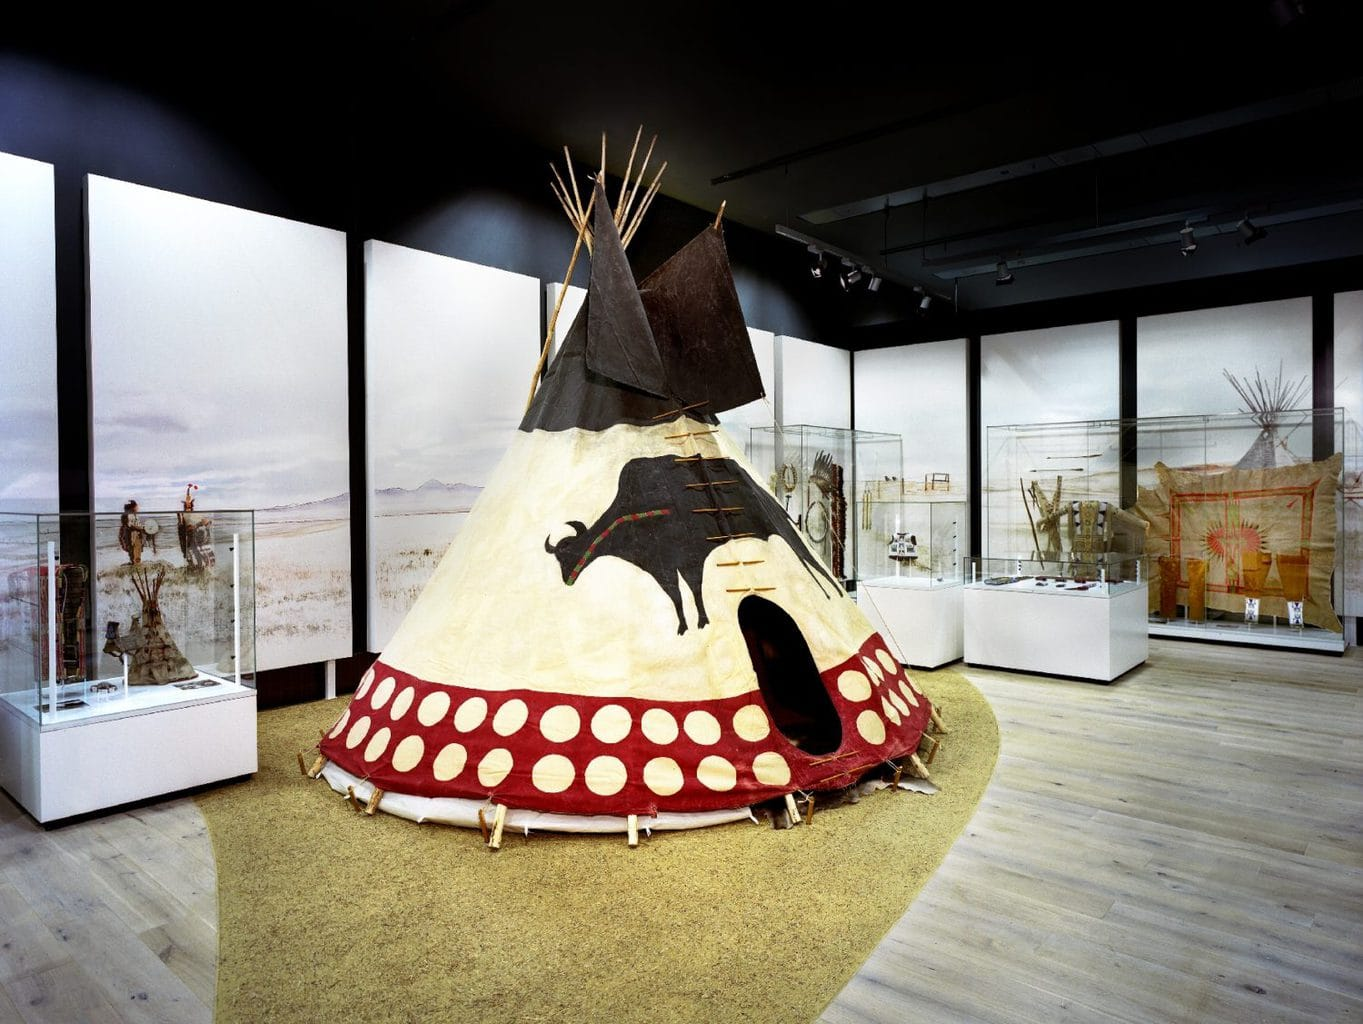 Het Rautenstrauch Joest Museum in Keulen